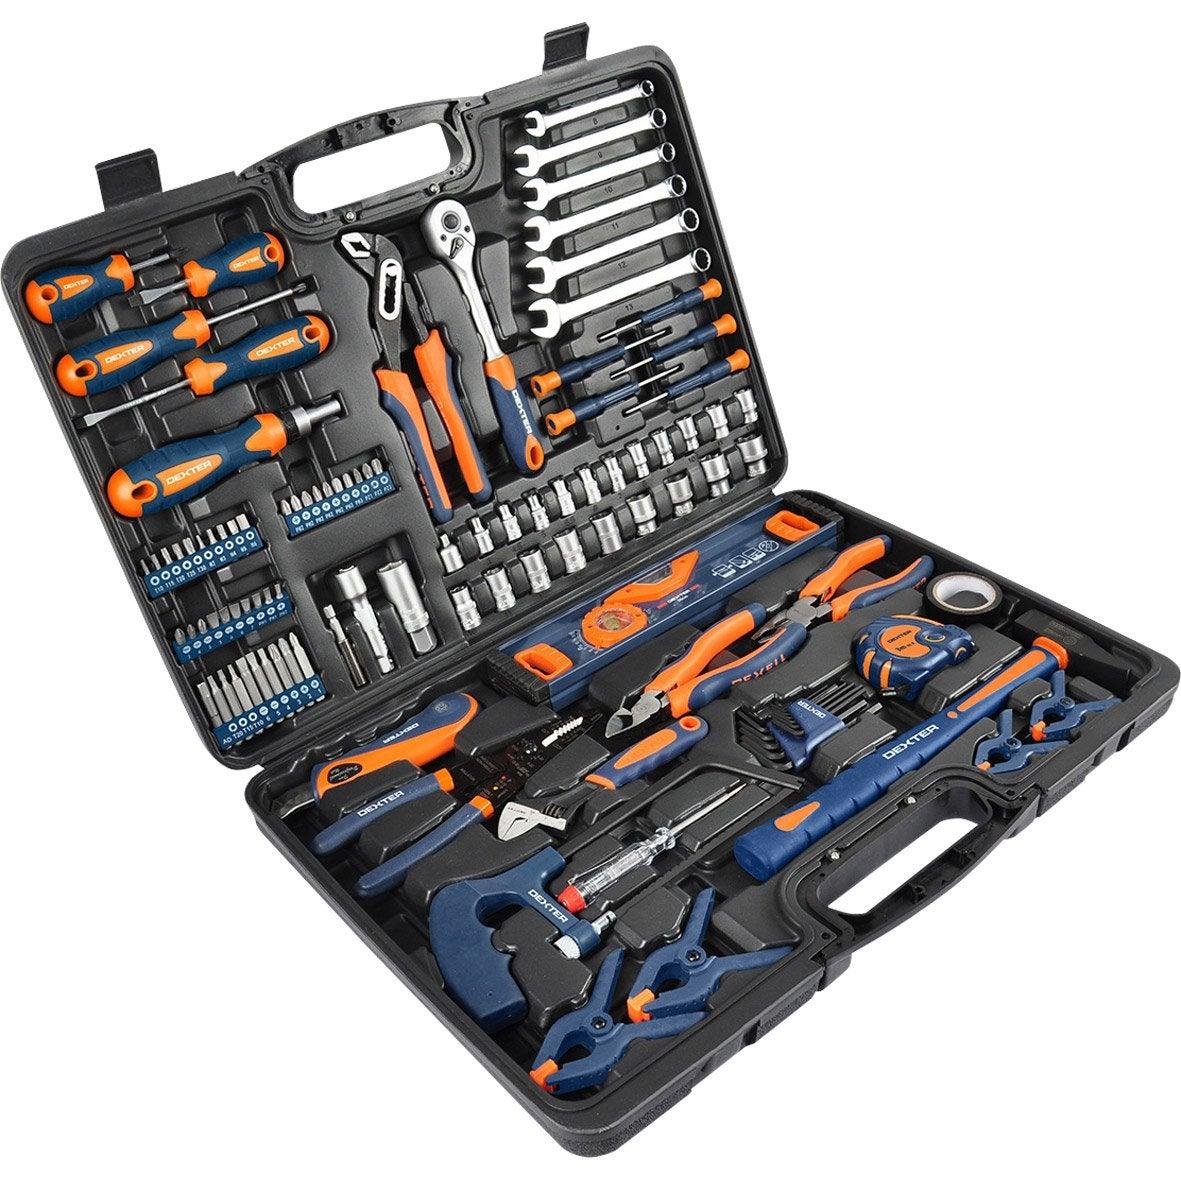 http://s2.lmcdn.fr/multimedia/131500517314/4d7c2586a4d35/produits/coffret-d-outils-108-pieces-dexter.jpg